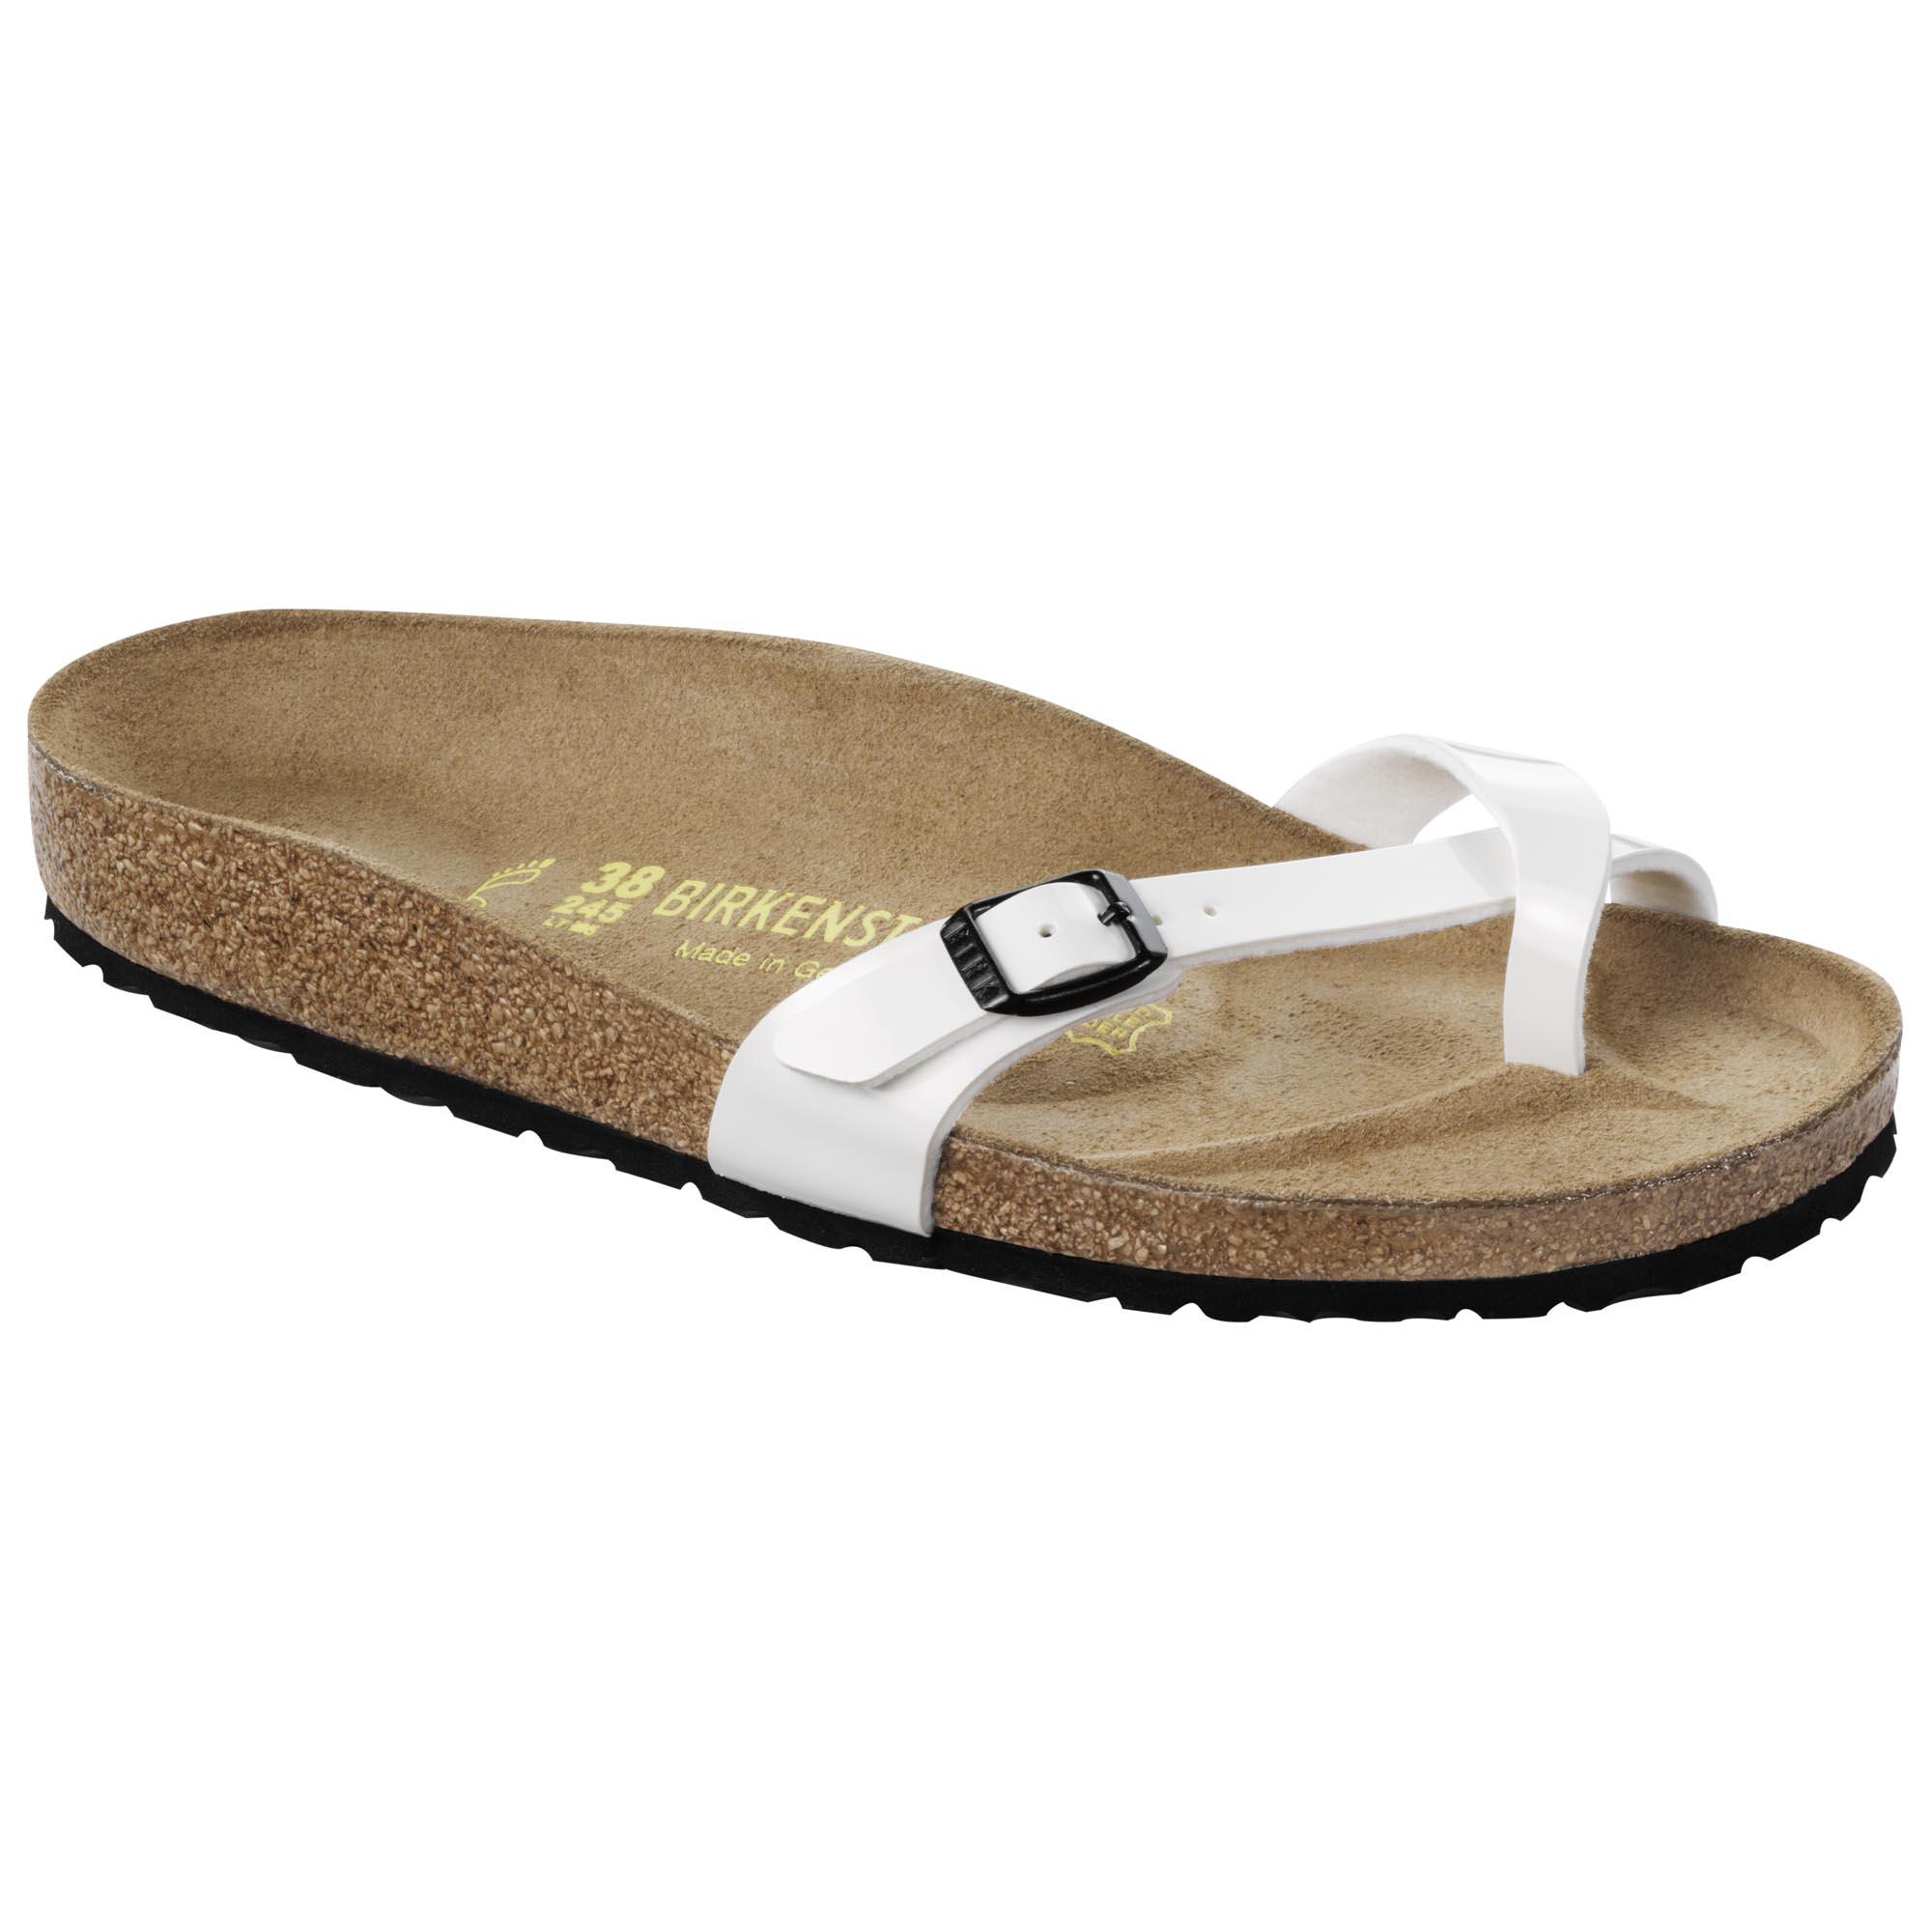 fc662c53dc53 Birkenstock Florida Soft Footbed Narrow Shoe 22